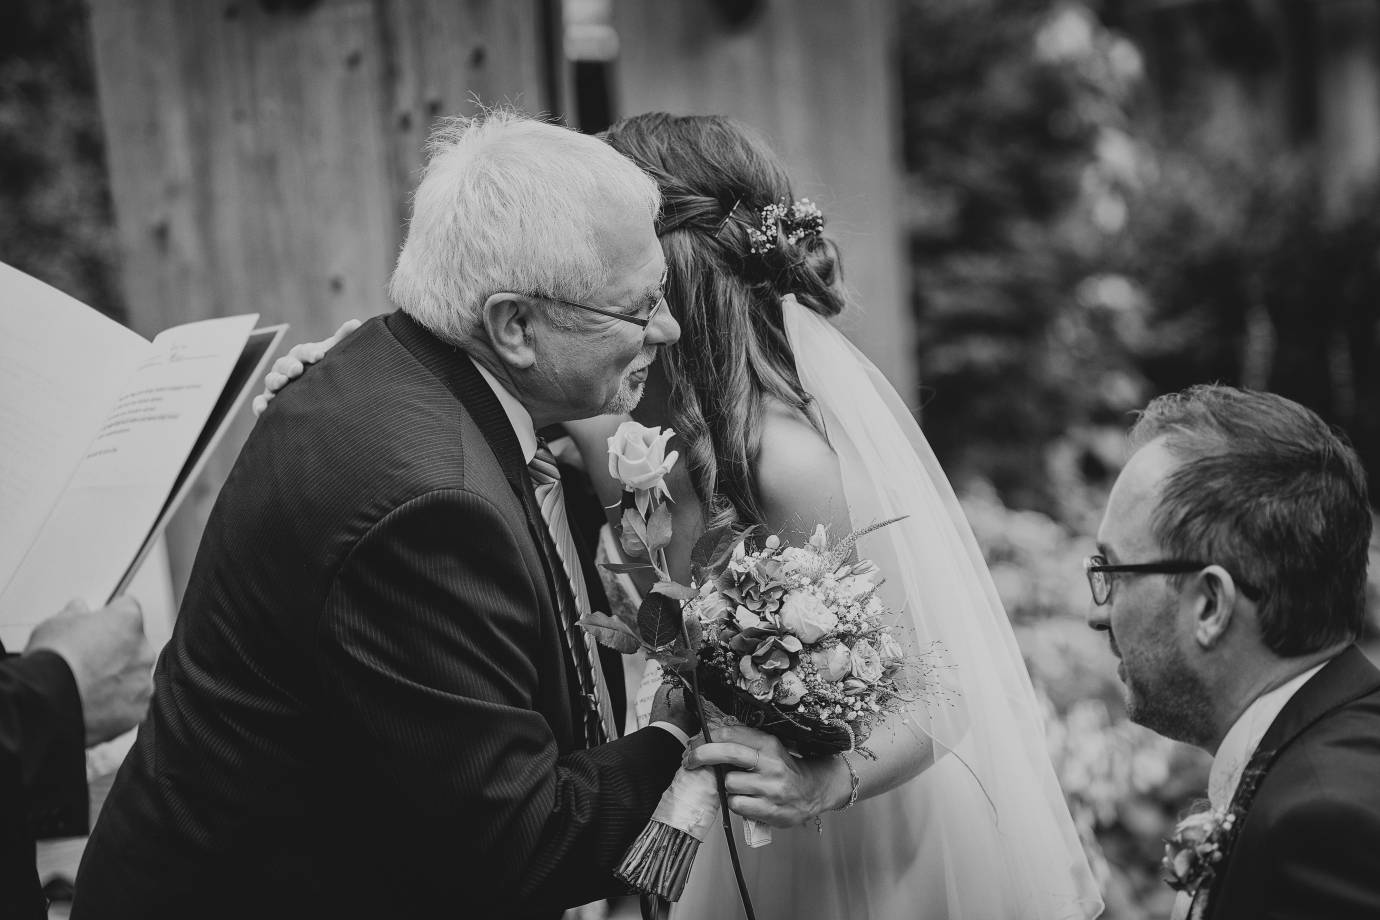 hochzeitsfotograf ganderkesee 104 - Christina+Andreas